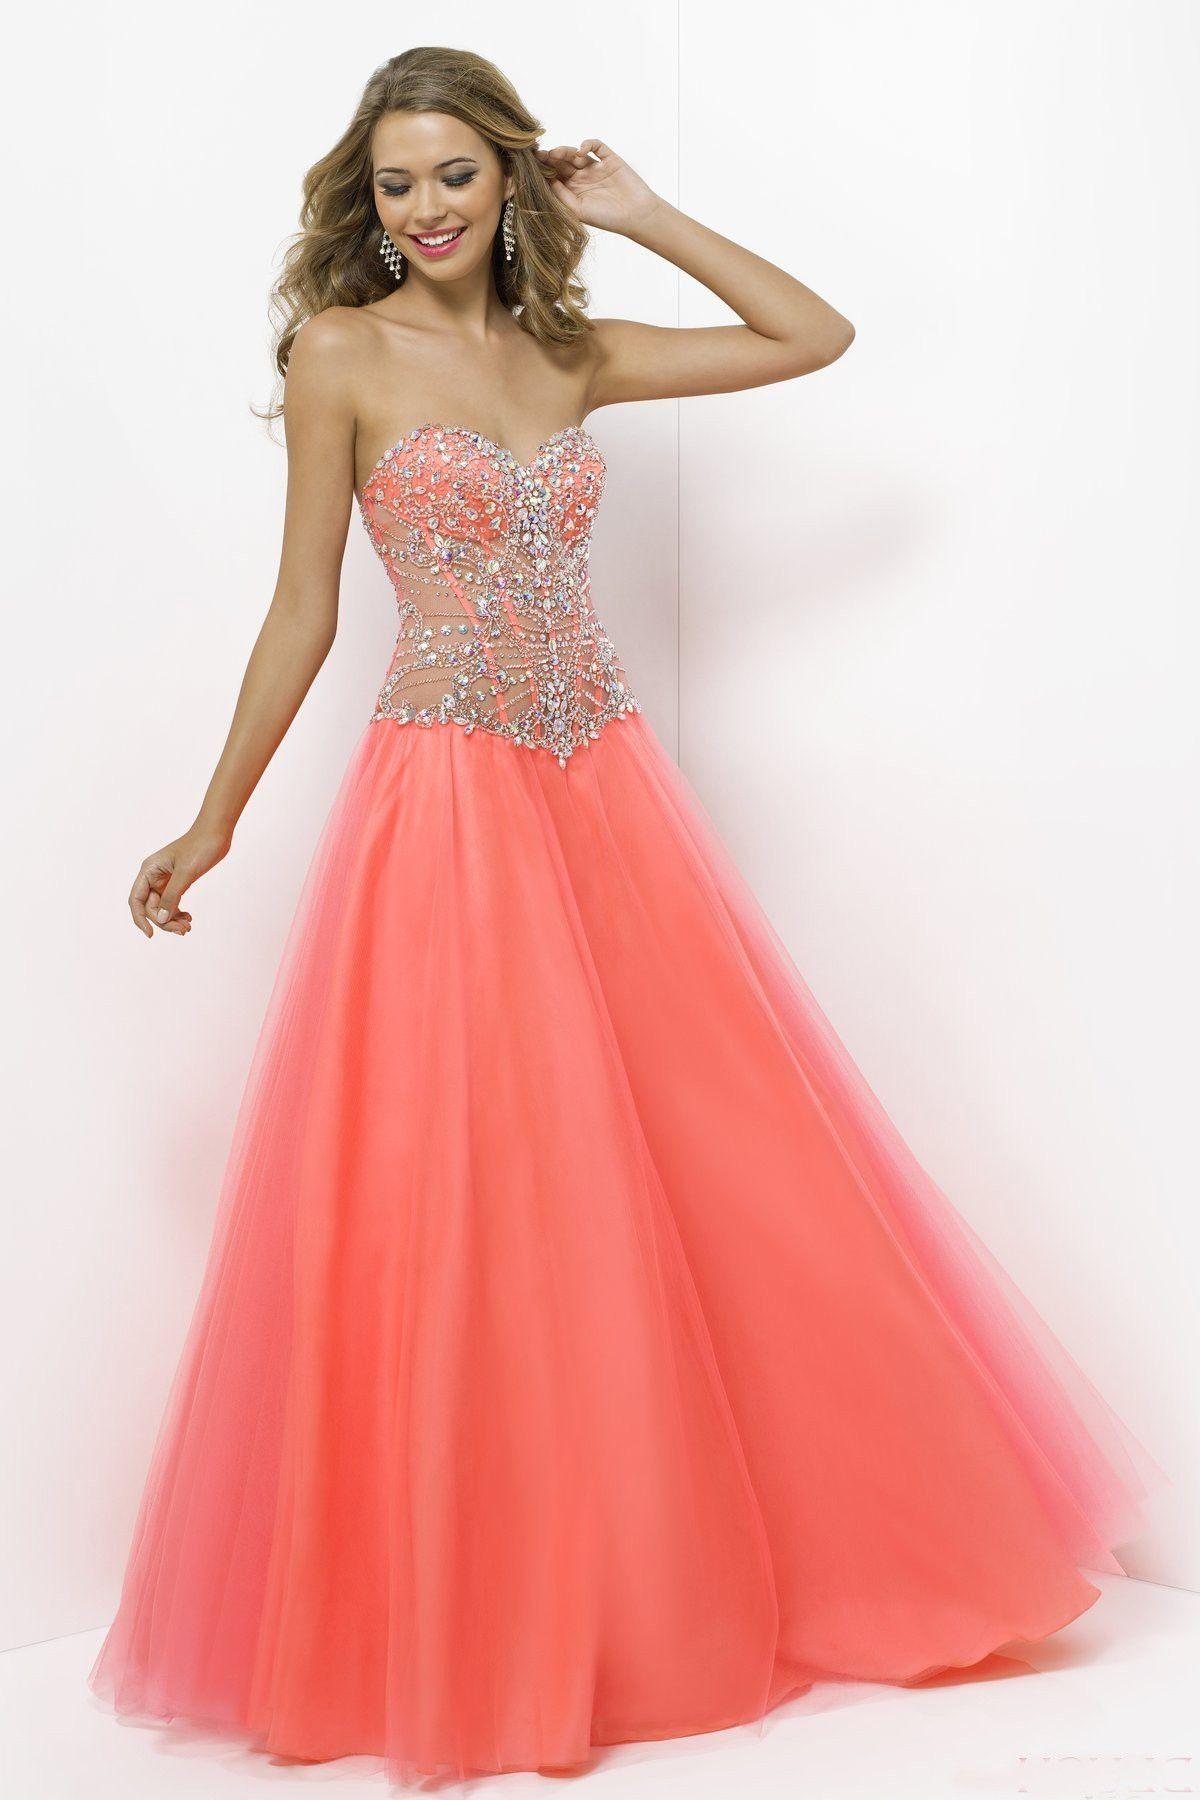 prom dresses prom dresses long prom dresses for teens long charming tulle  beaded sweetheart floor-length prom dress with diamond